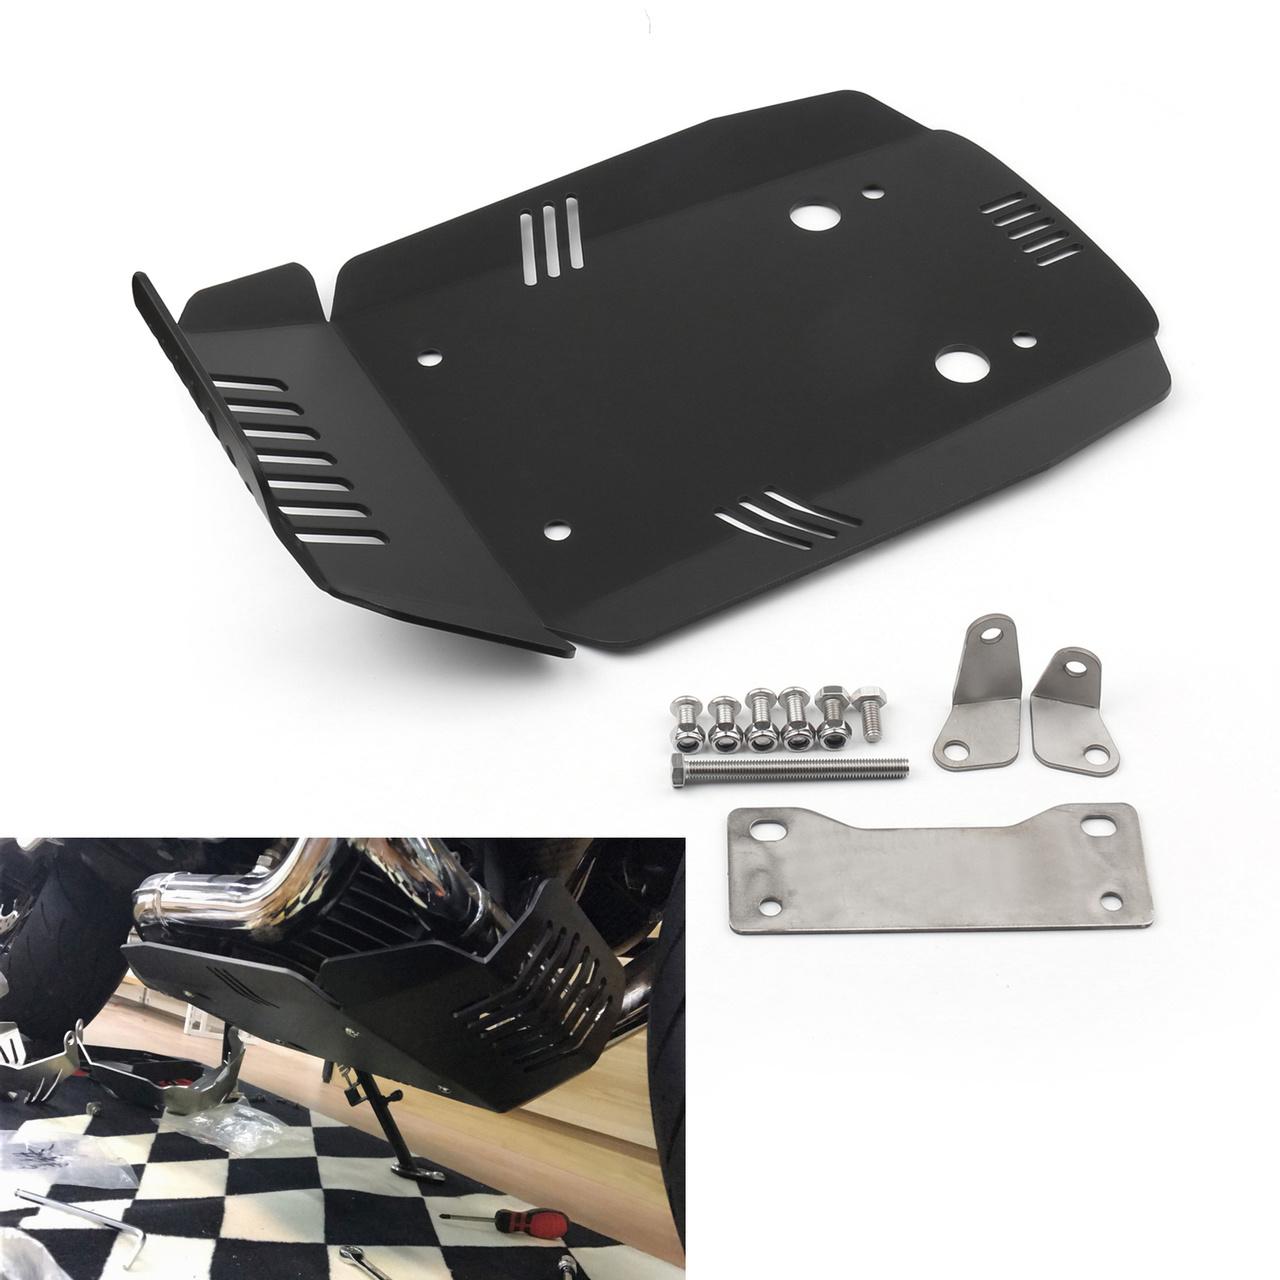 Bmw R NineT Engine block protector plate - CafeRacerWebshop com